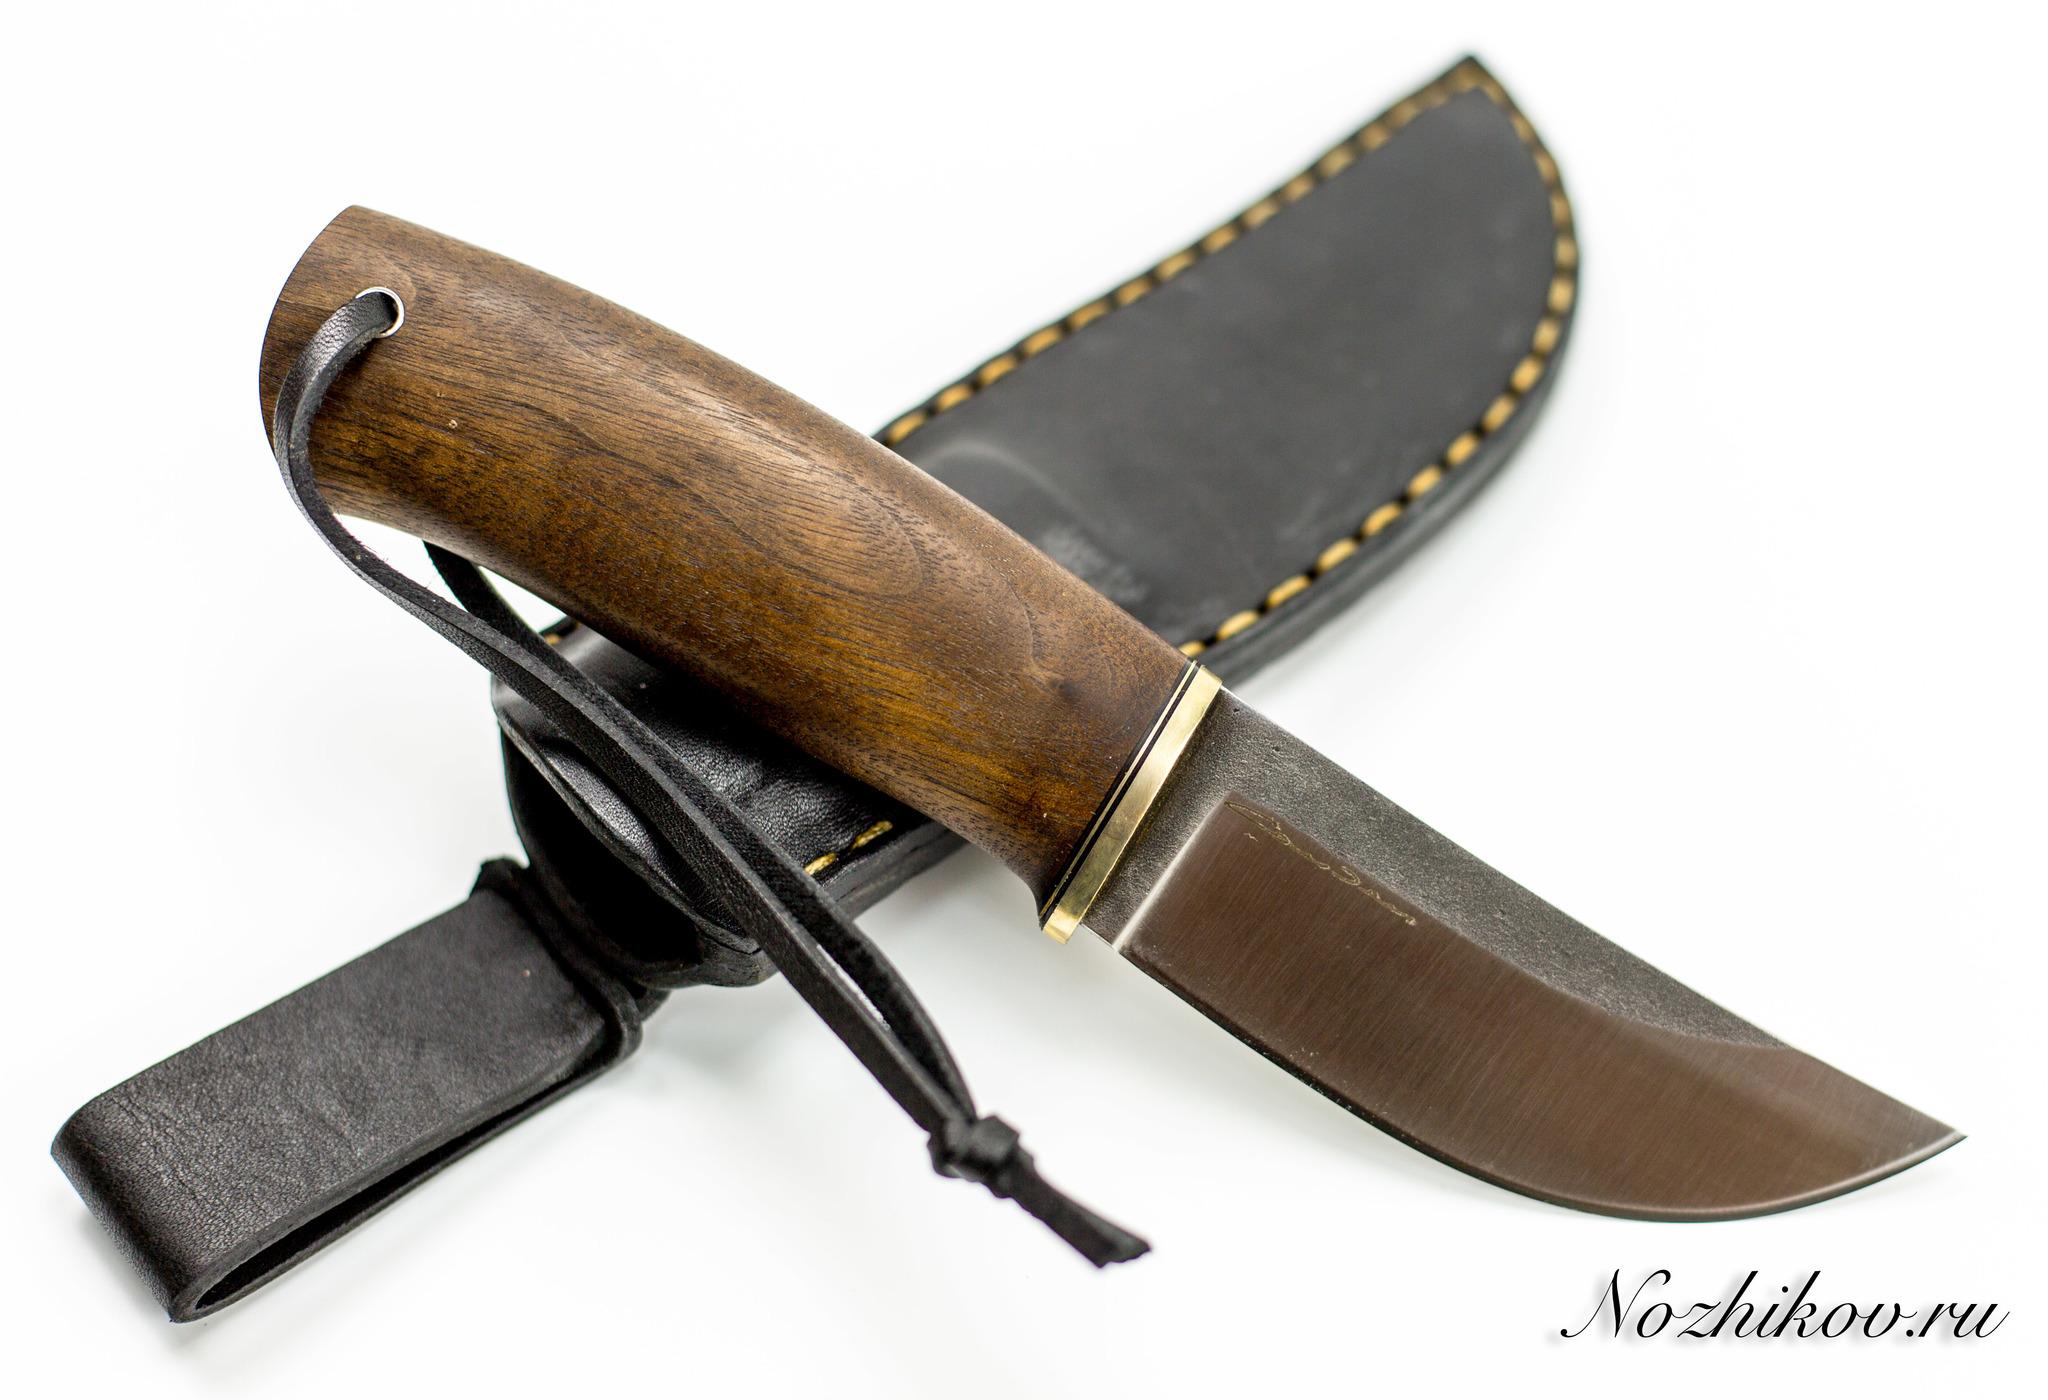 Нож Шмель, сталь K110, орех нож страйт сталь 65х13